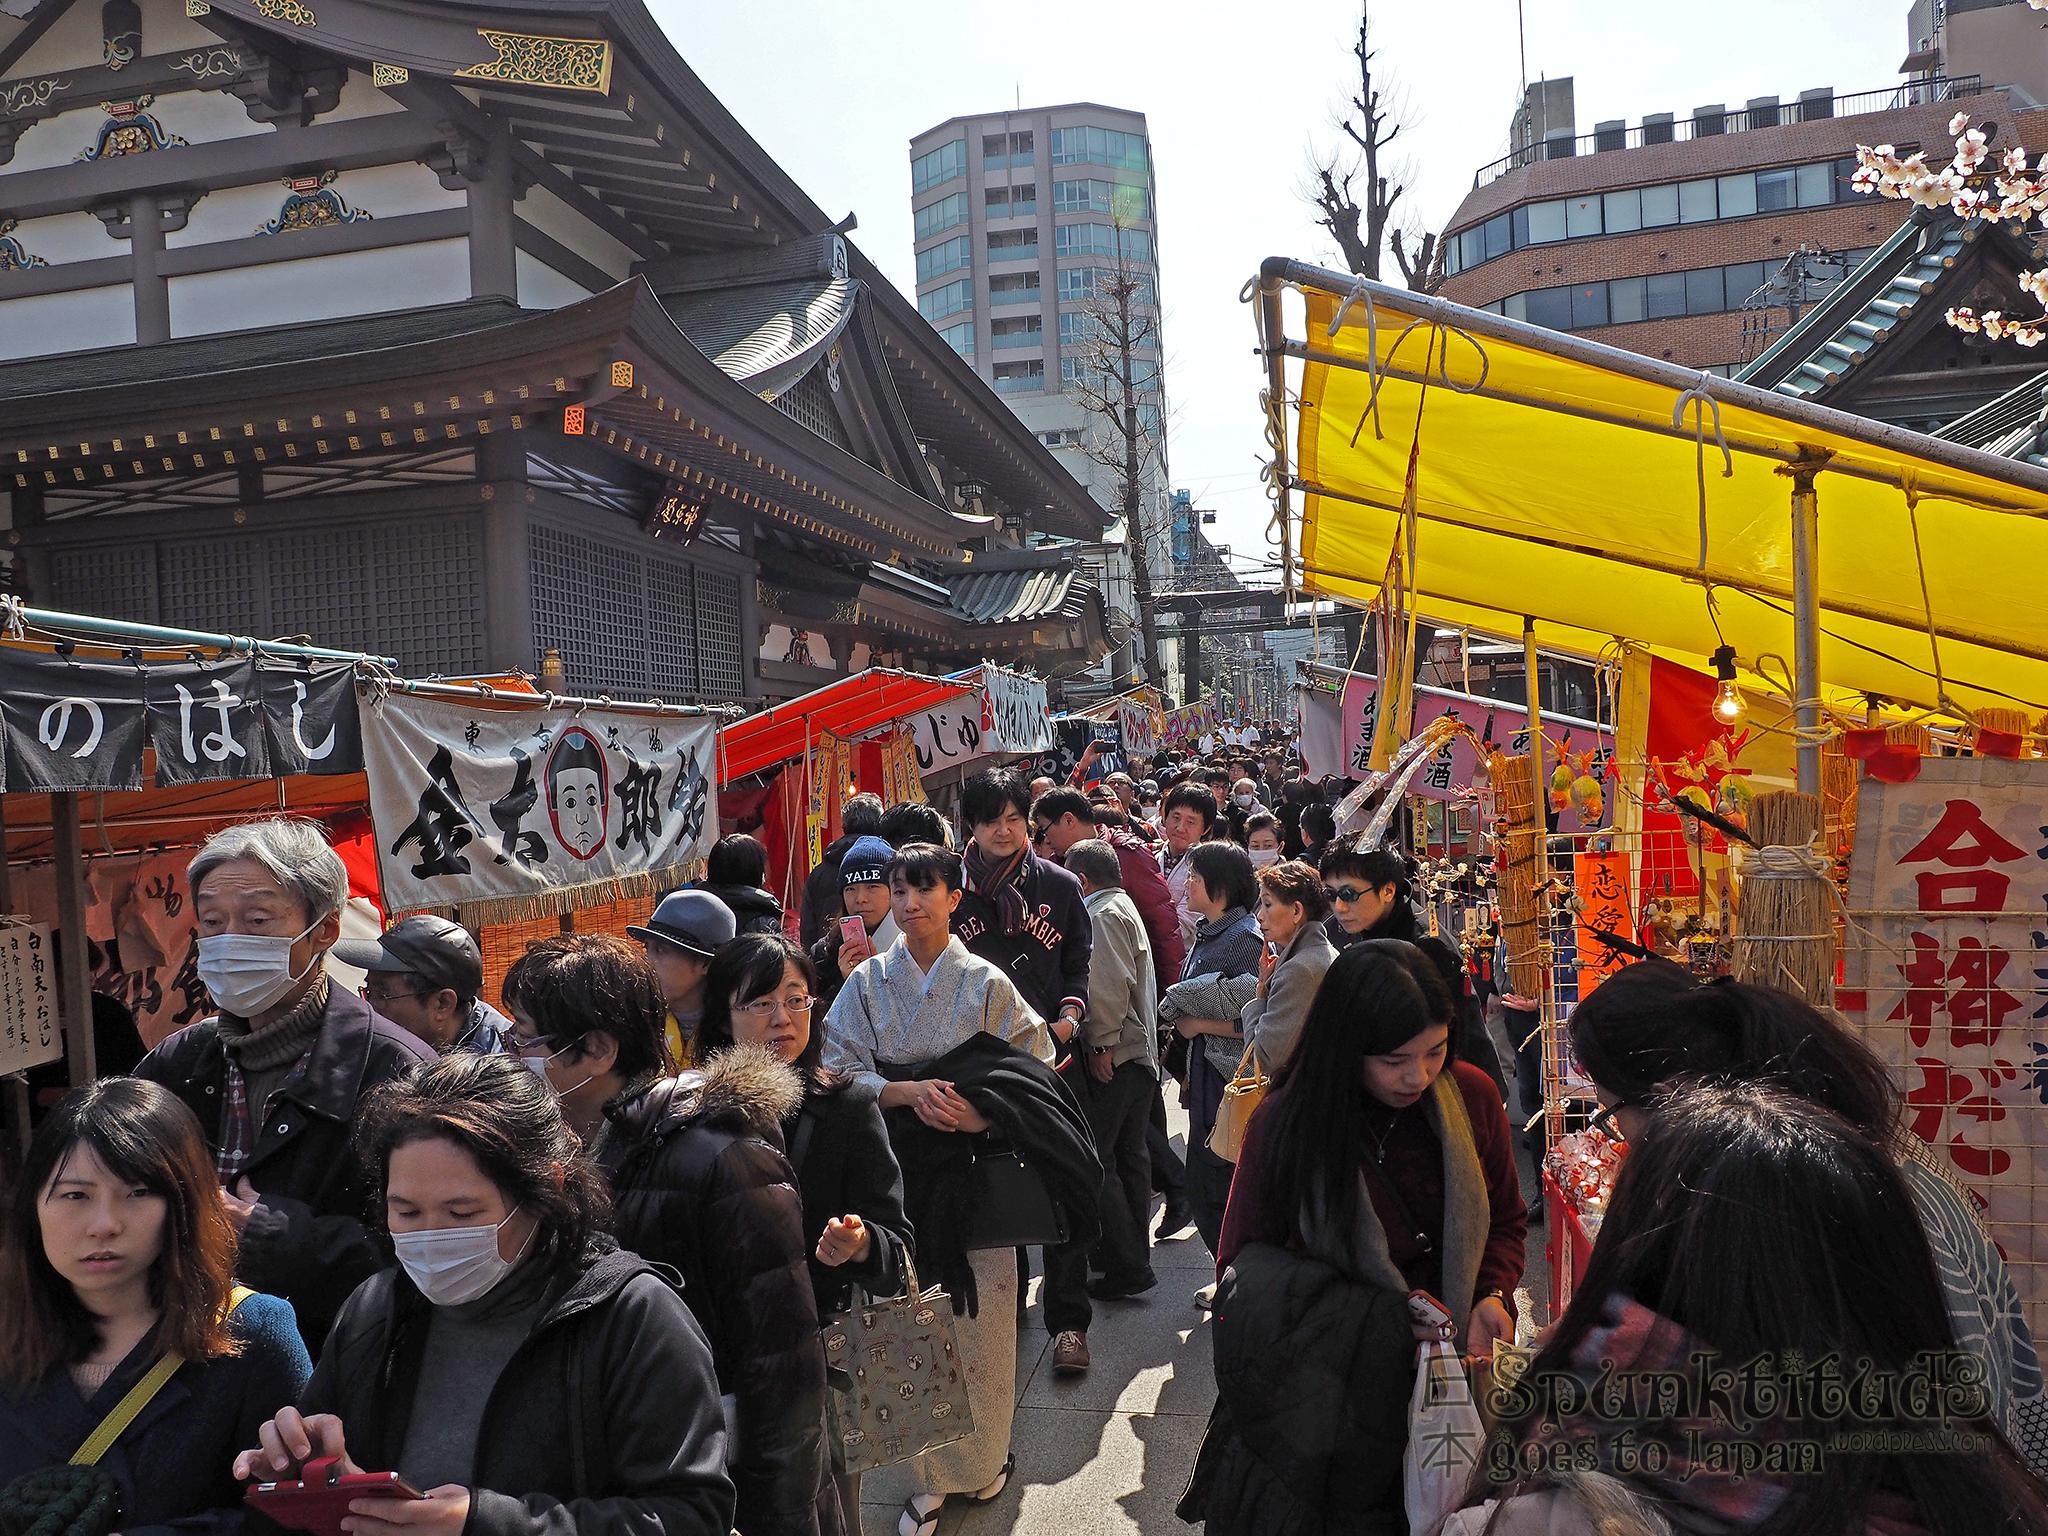 Yushima Tenjin Plum Blossom Festival